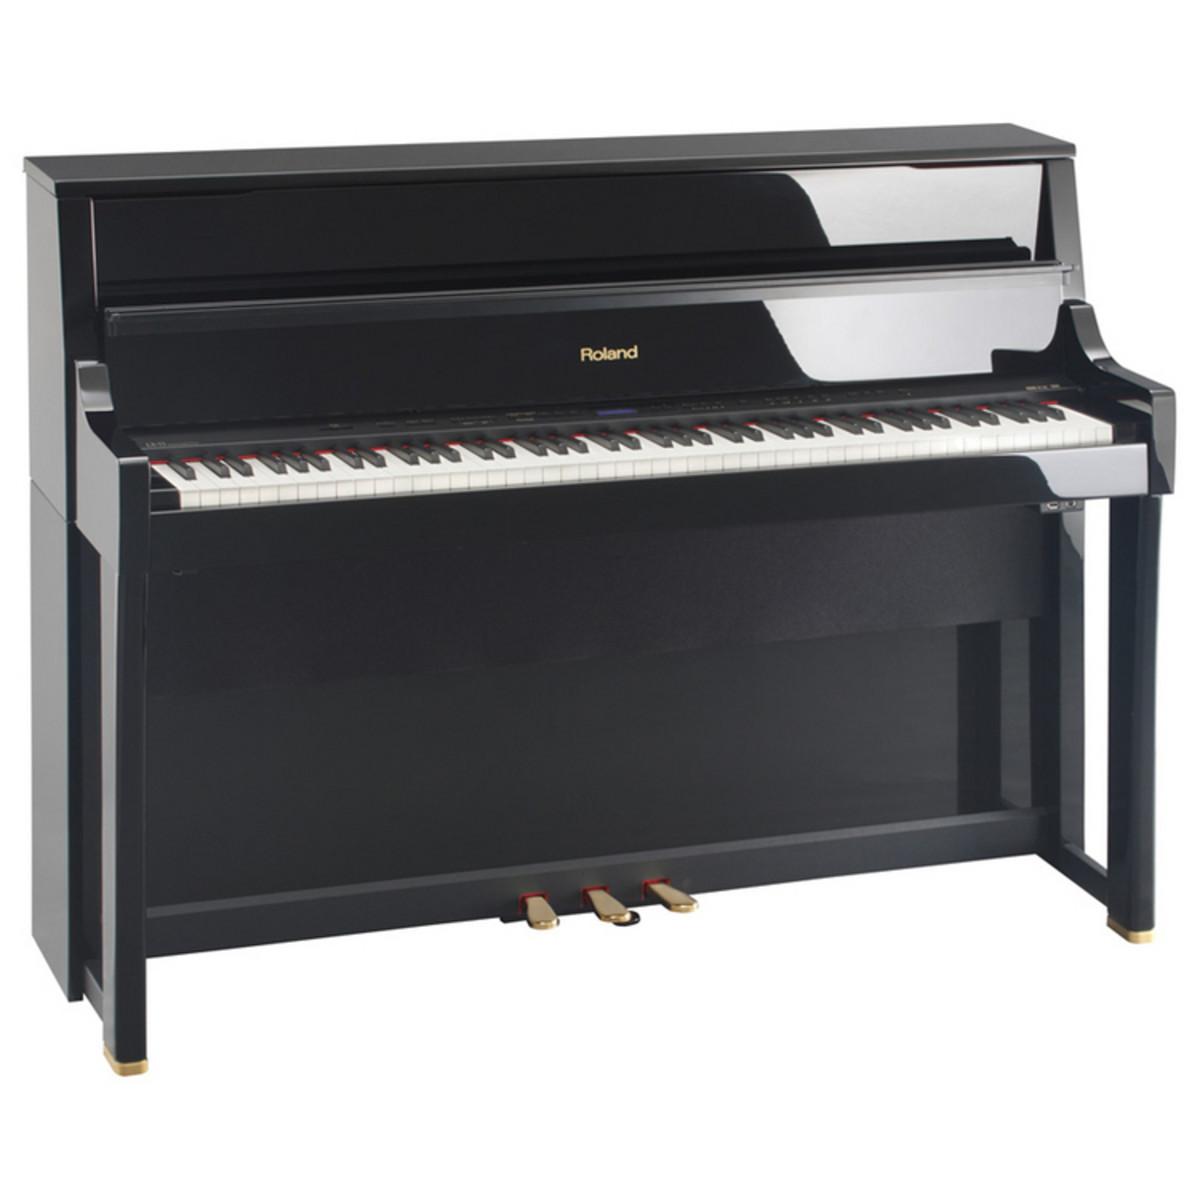 roland lx 15 pianos vertical bano pulido ex demo en. Black Bedroom Furniture Sets. Home Design Ideas